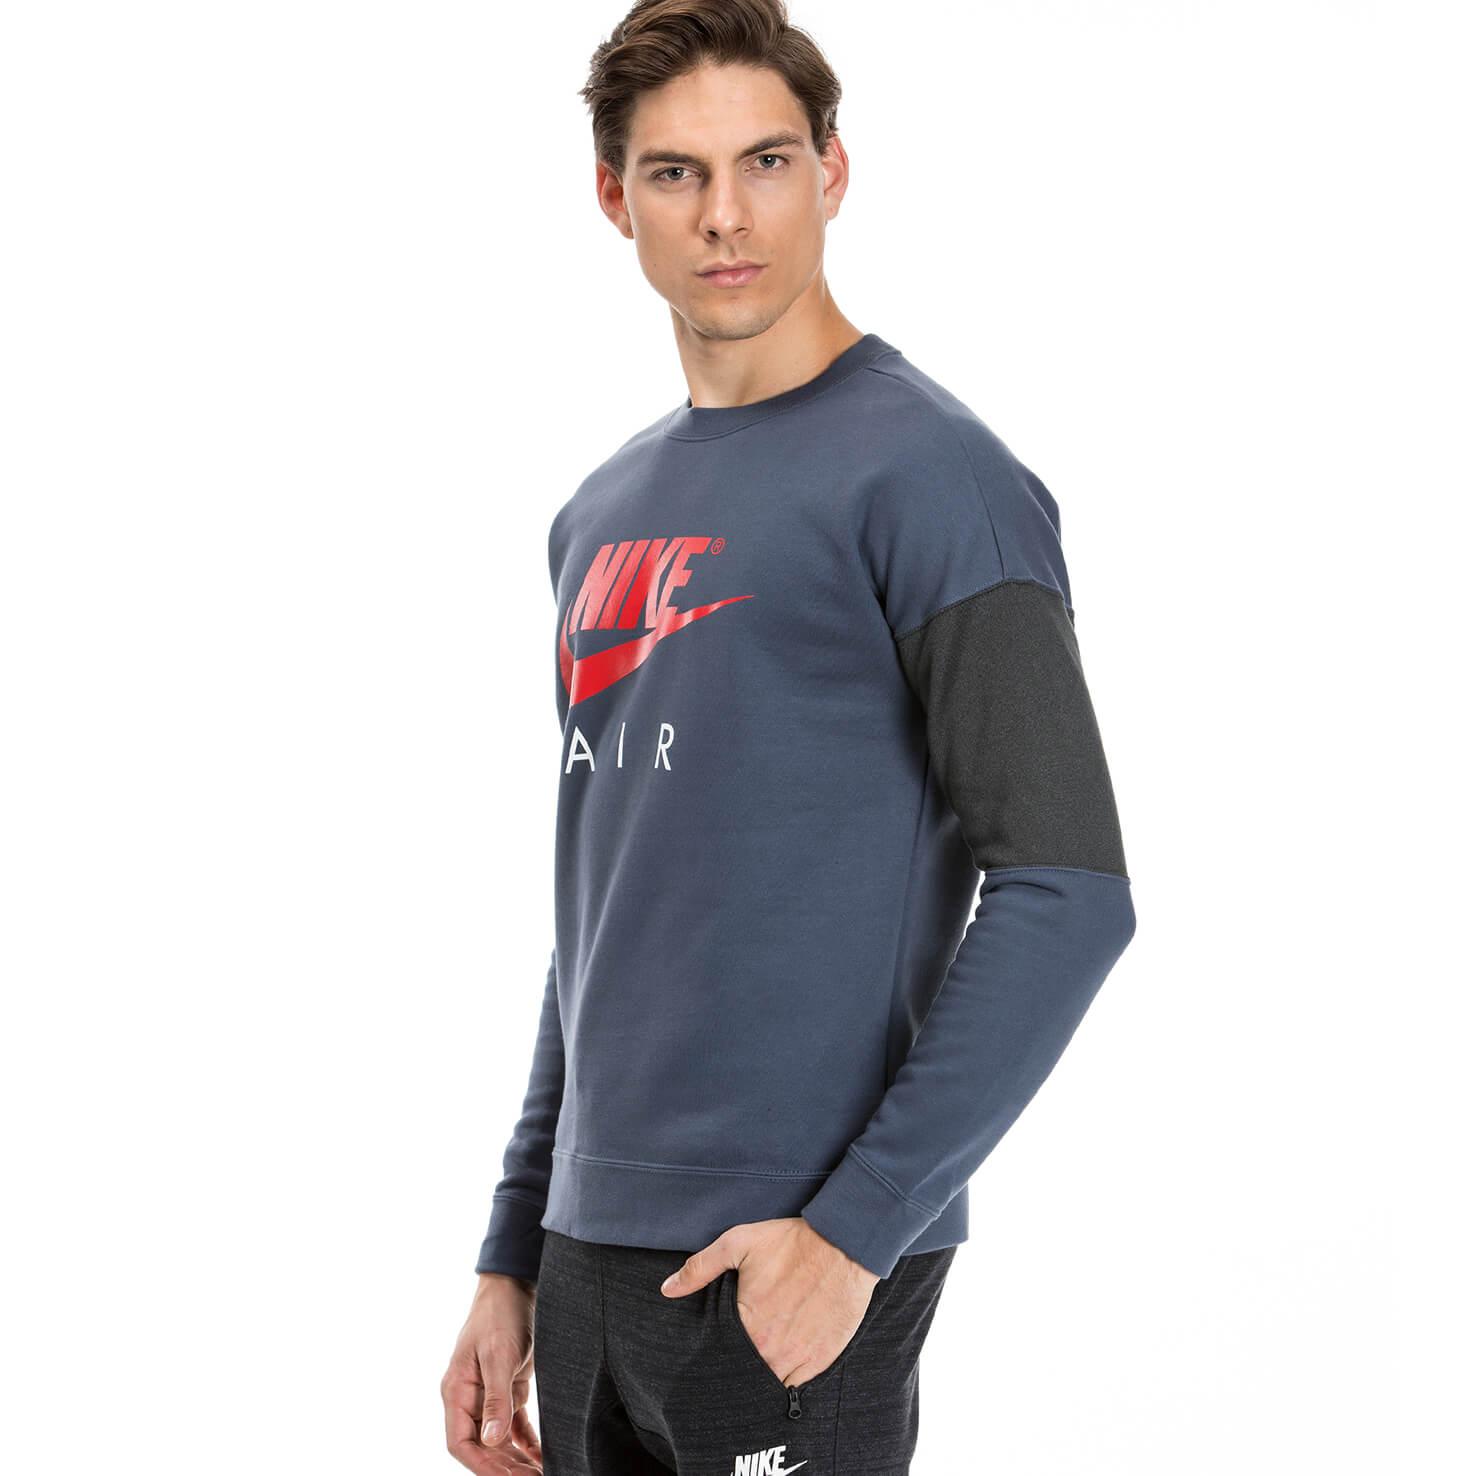 Nike Crw Ls Air Erkek Lacivert Sweatshirt